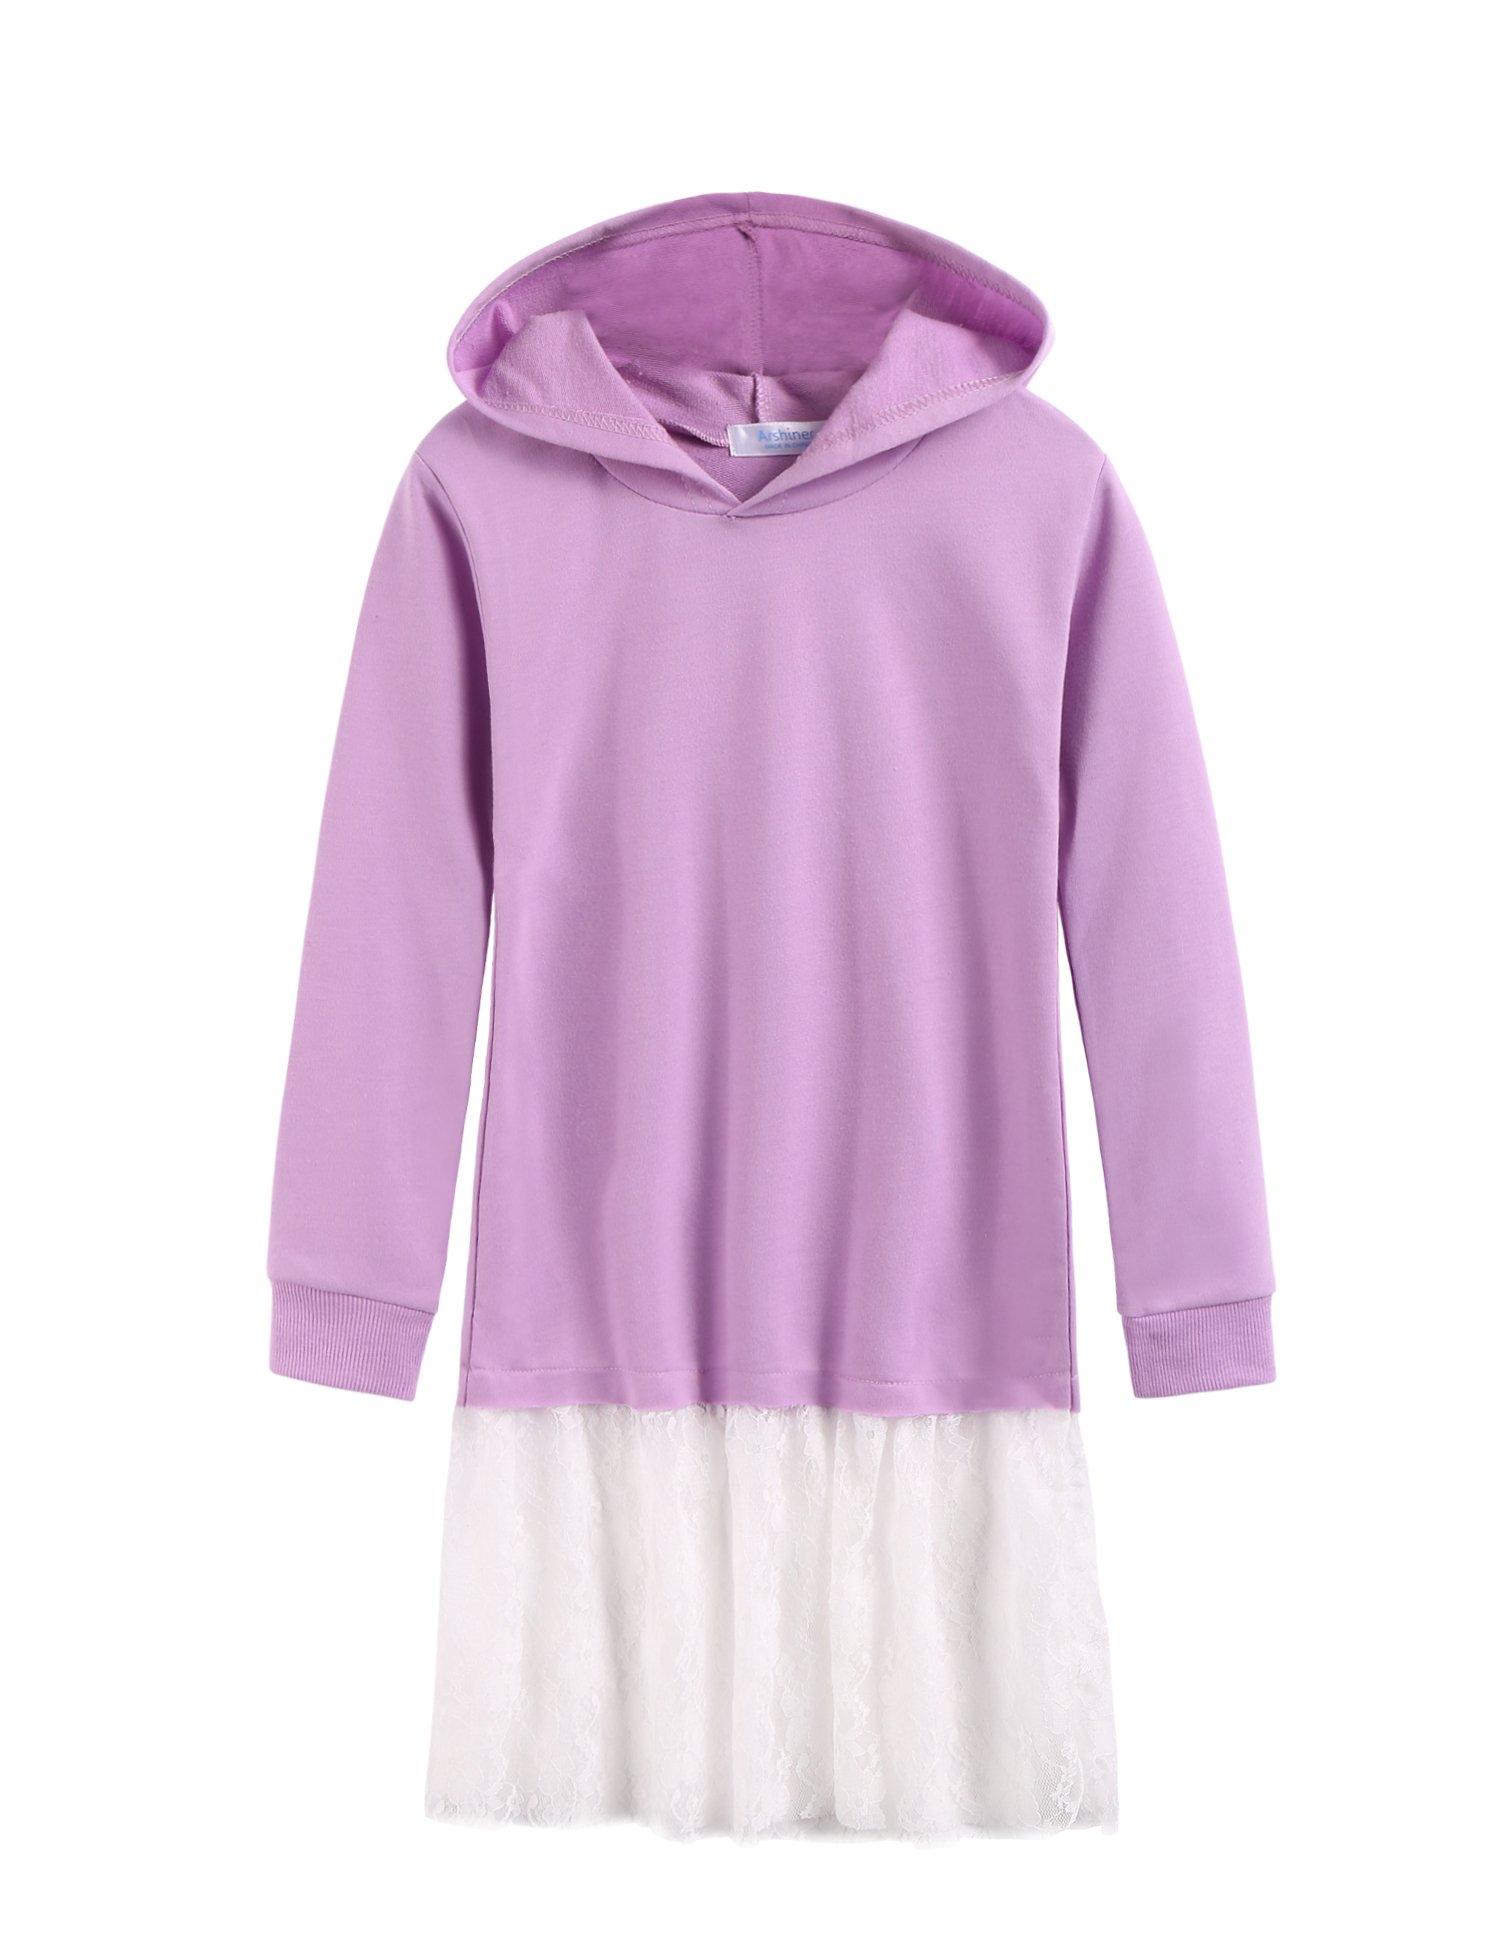 Arshiner Girl's Casual Long Sleeve Sweatshirts Dress with Hoodie, Purple 140